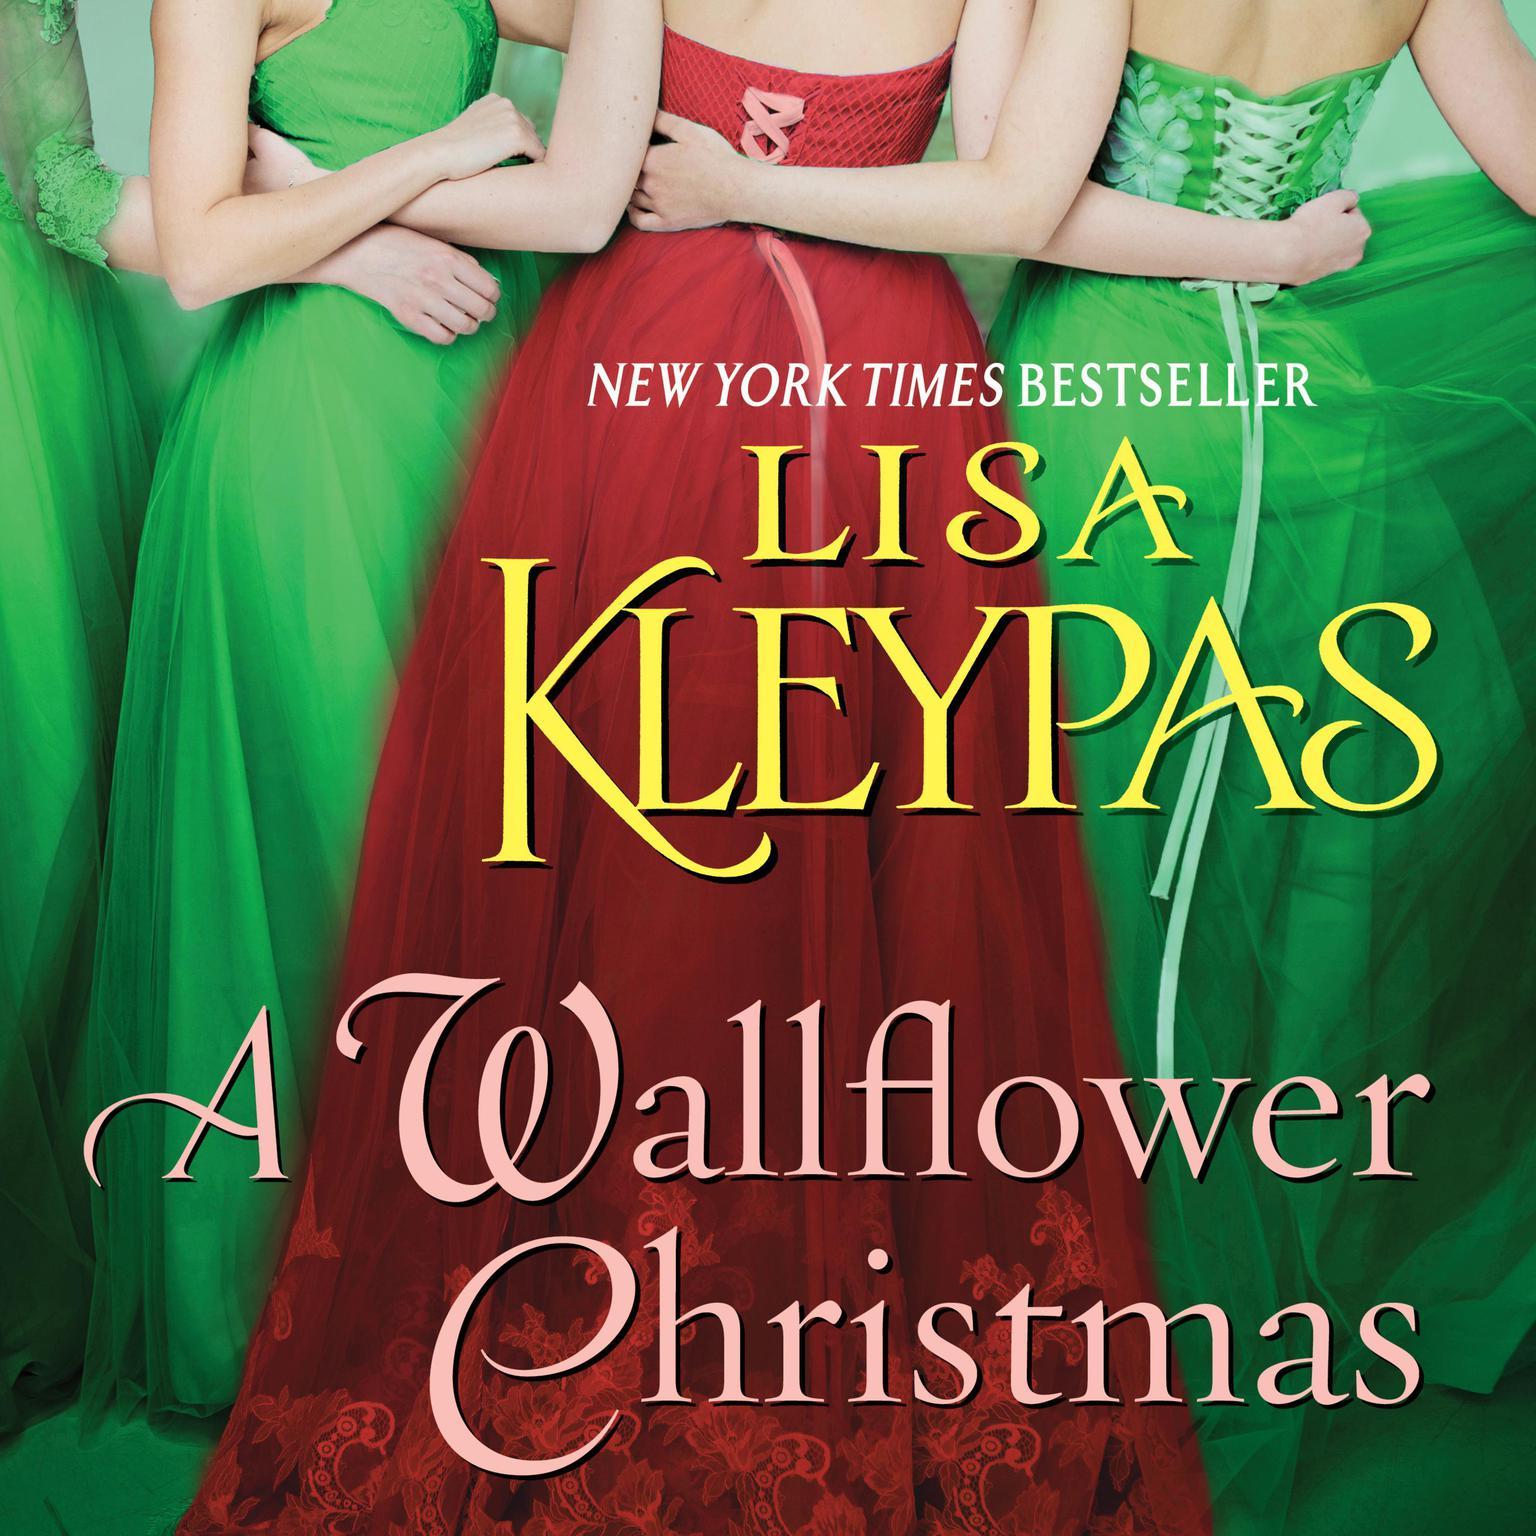 A Wallflower Christmas: A Novel Audiobook, by Lisa Kleypas